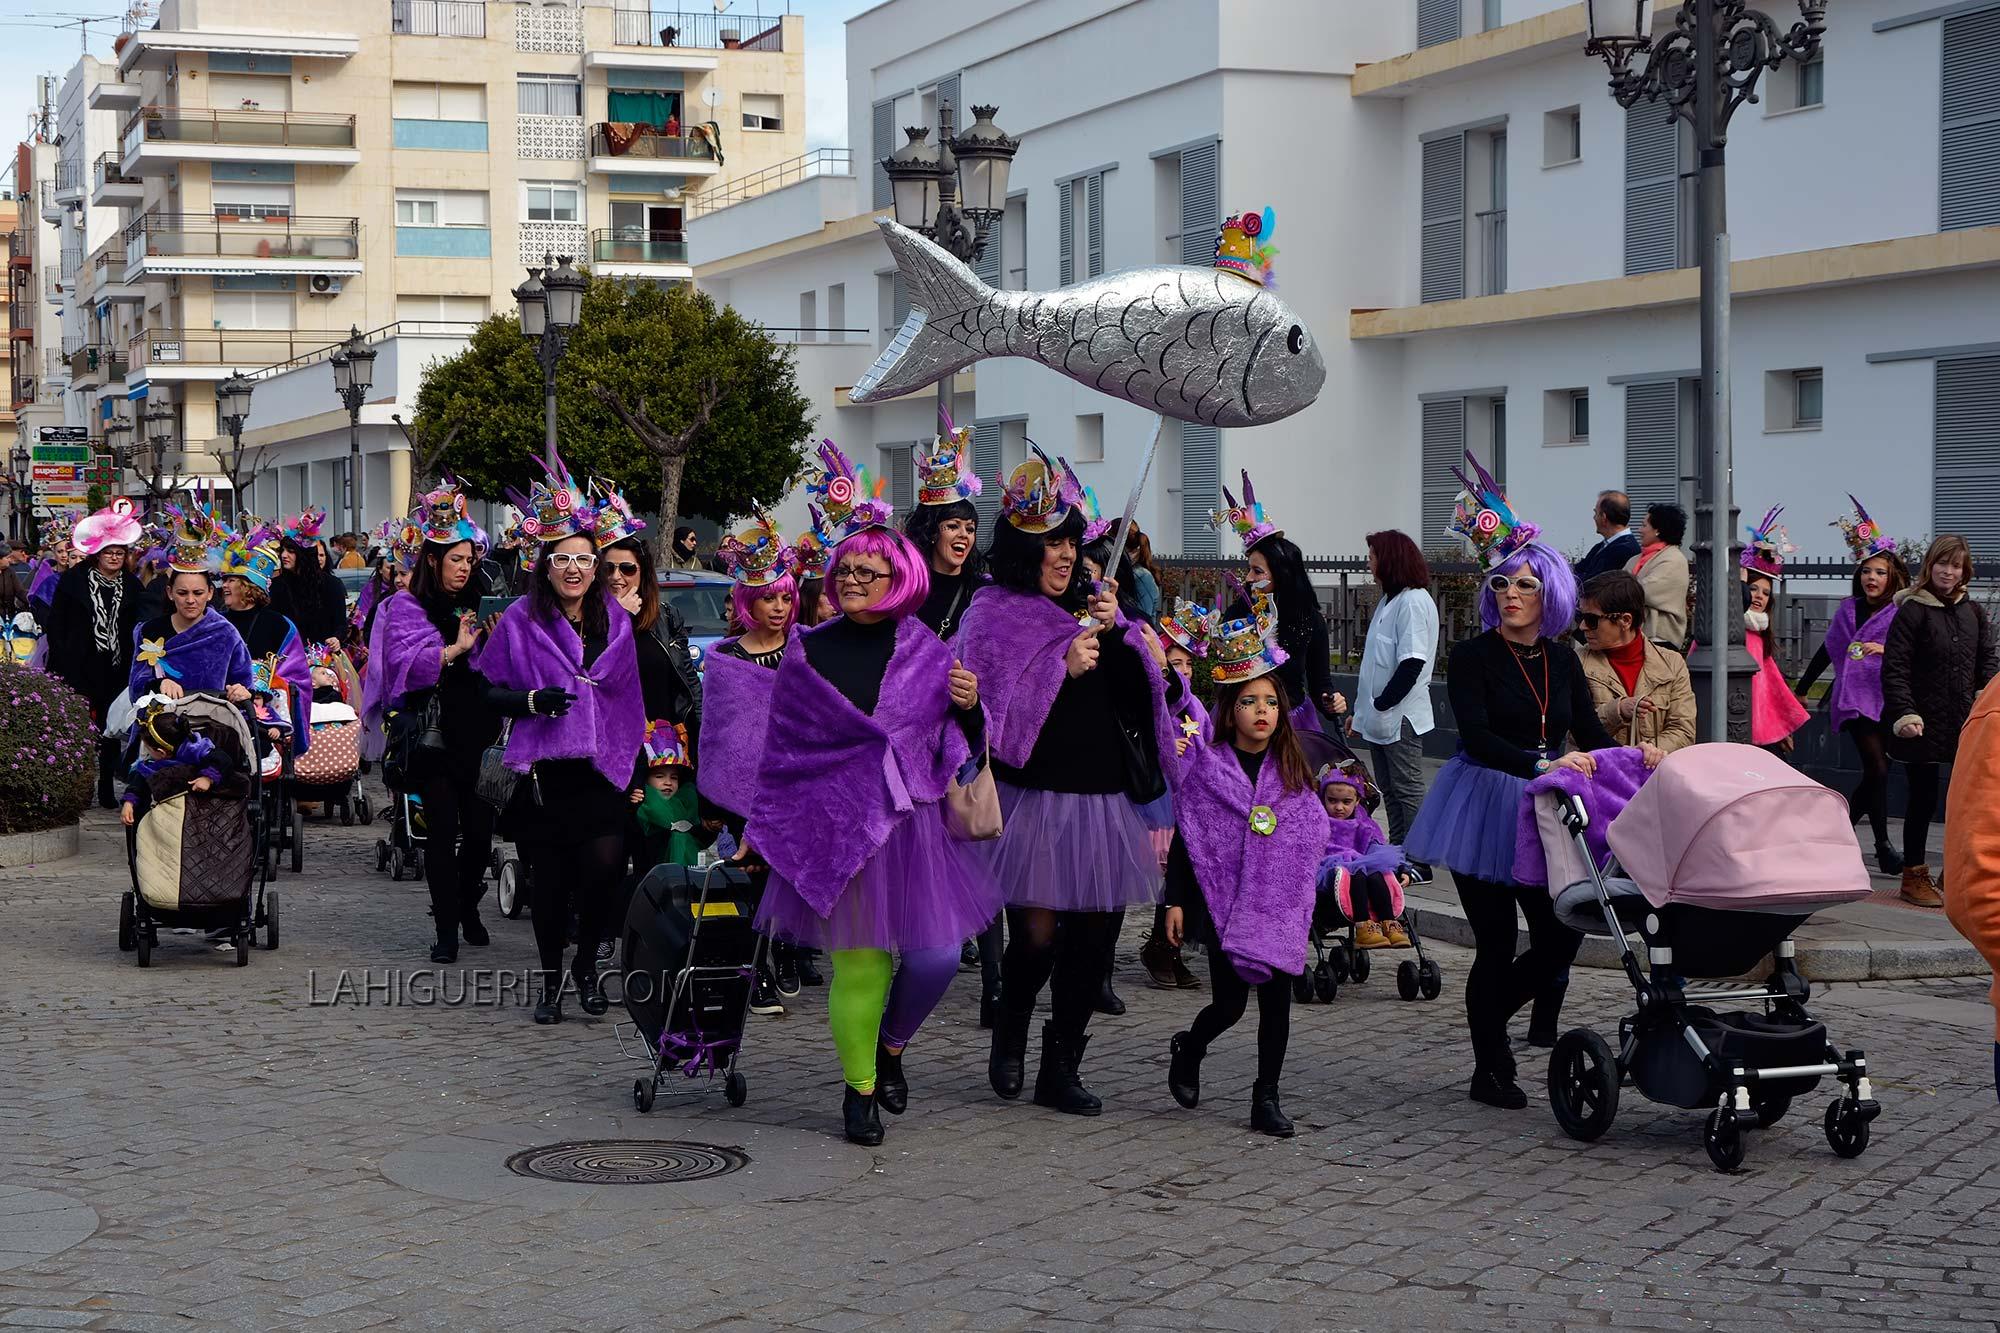 Cabalgata infantil de viudas carnaval de Isla cristina 2016 _DSC1910